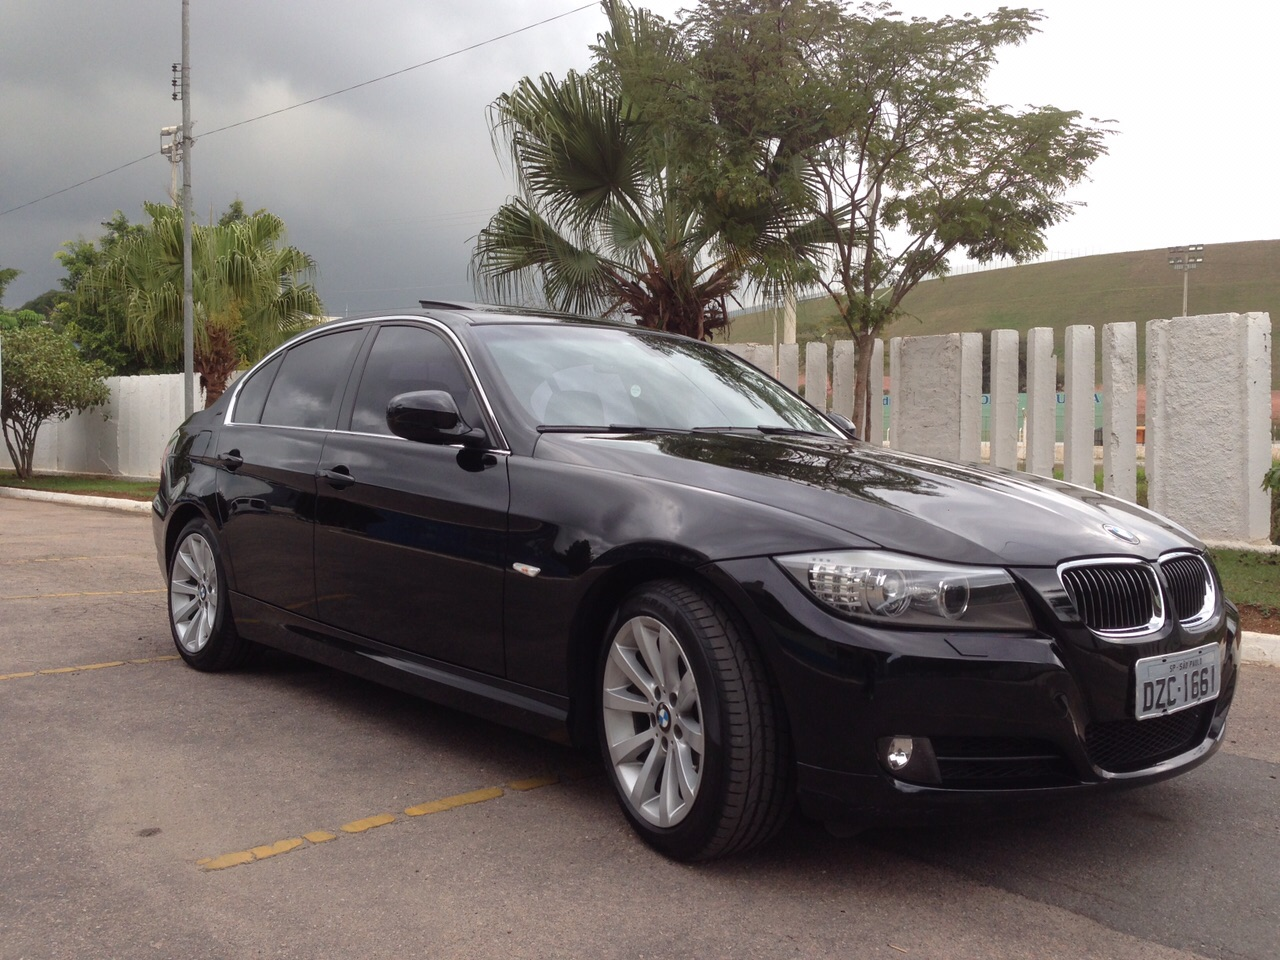 BMW 325i 2.5 6 Cilindros